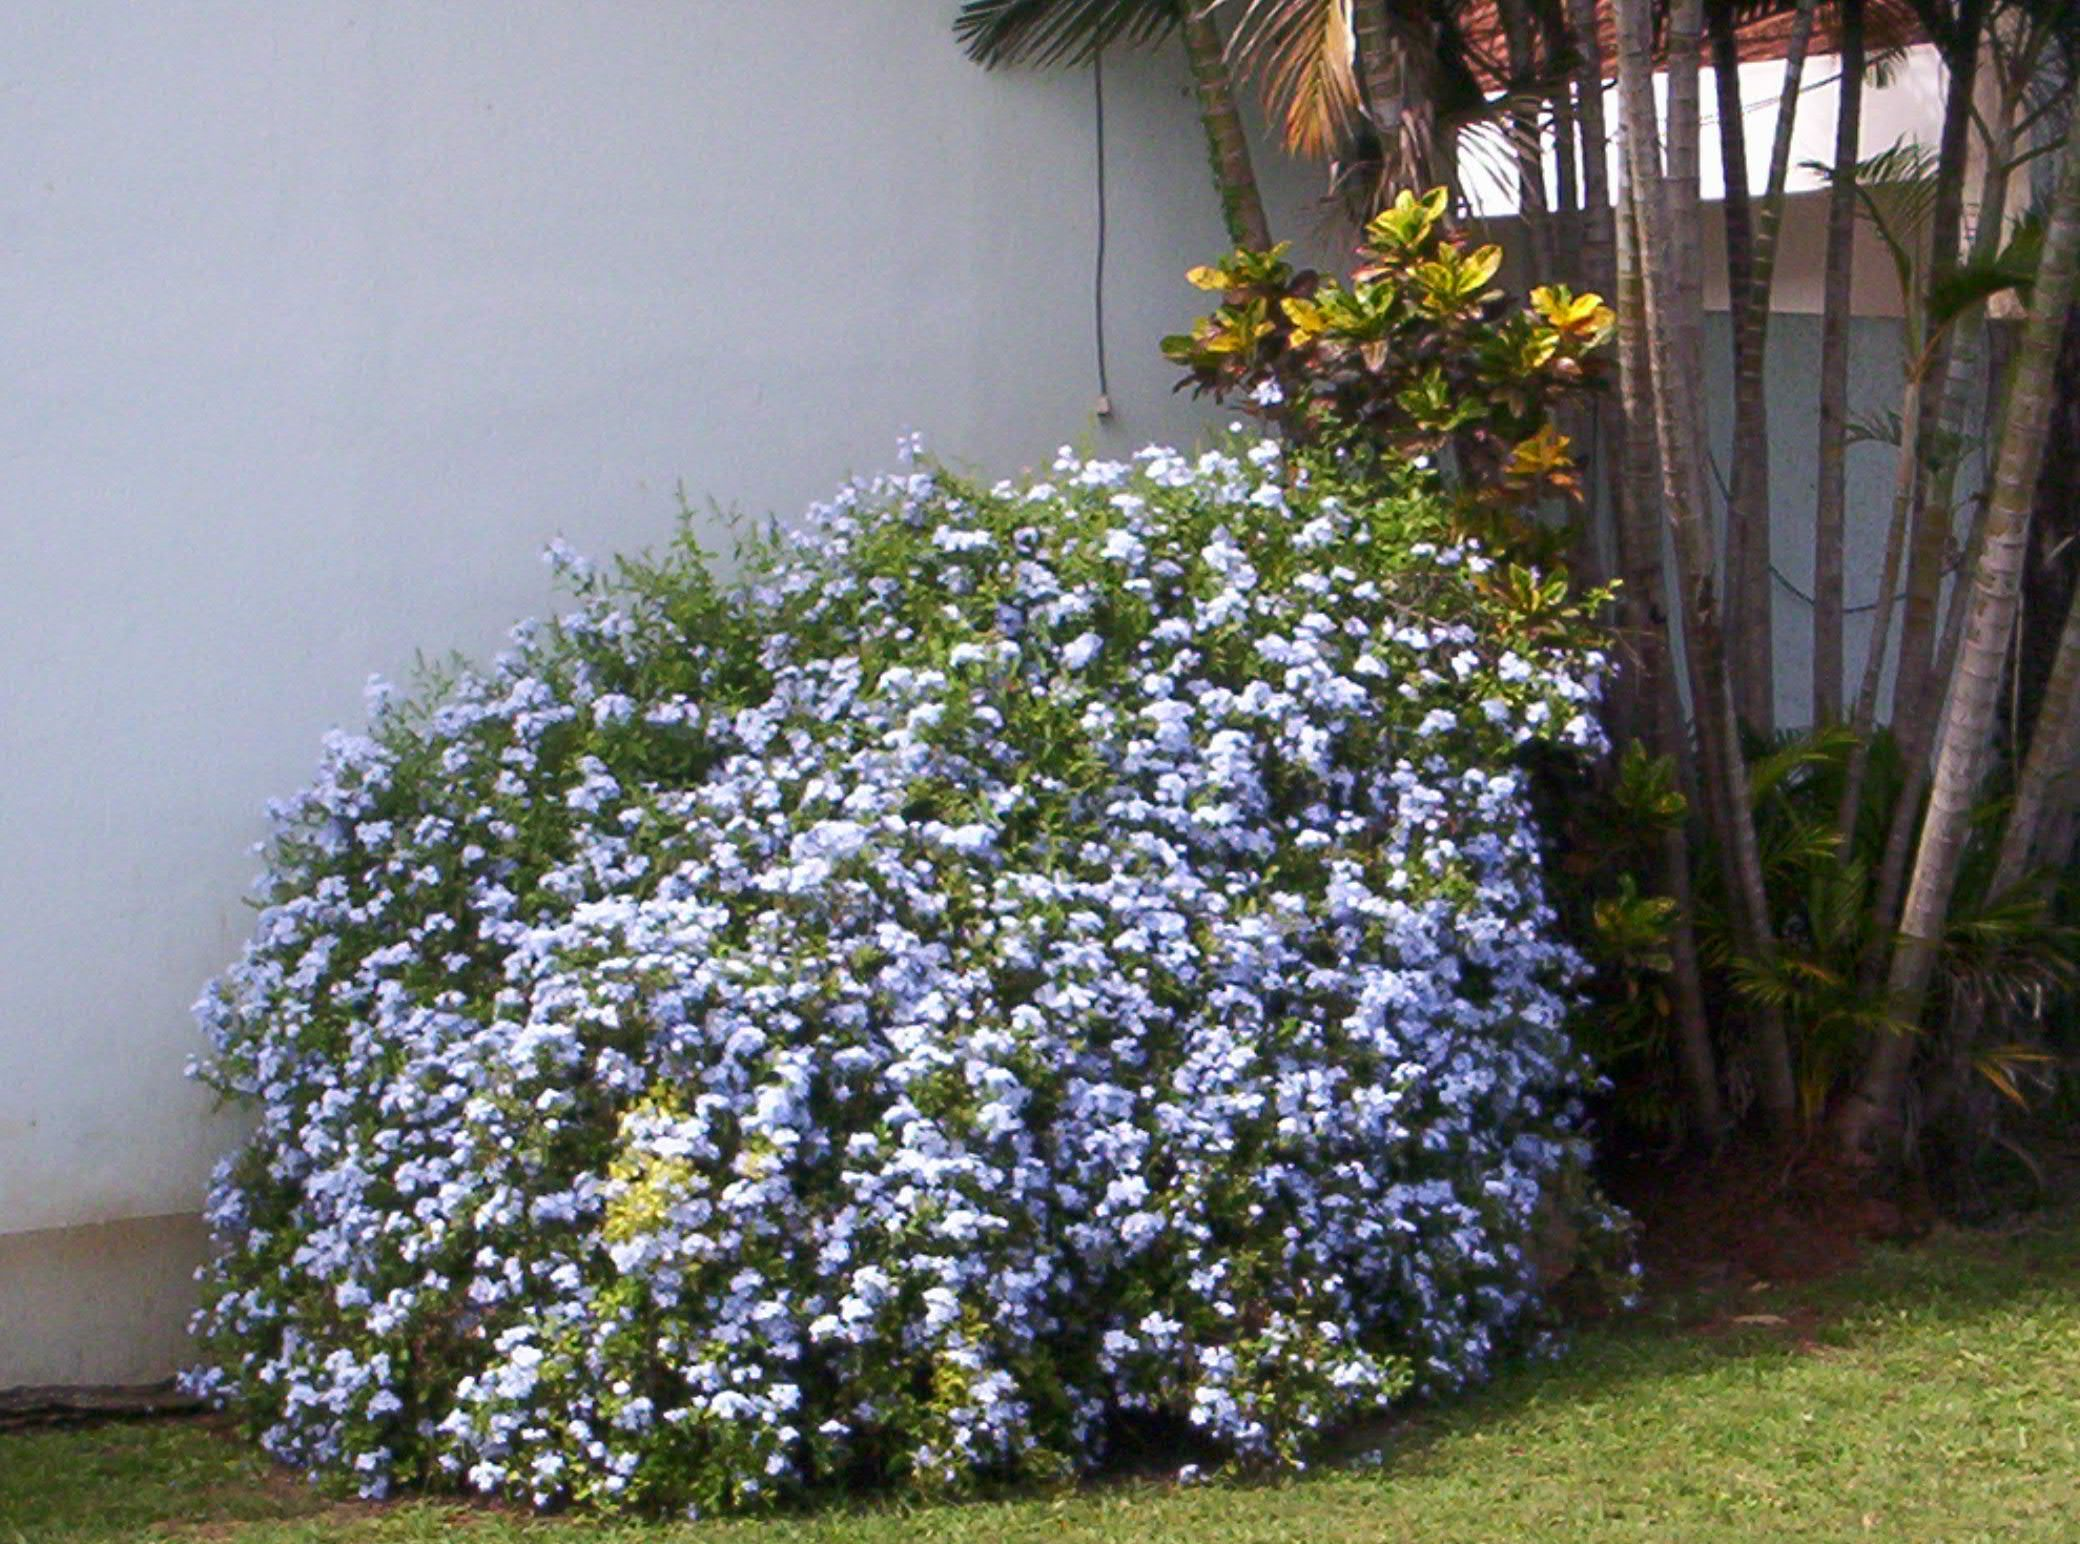 arbustos ornamentales arbustos ornamentales fotos